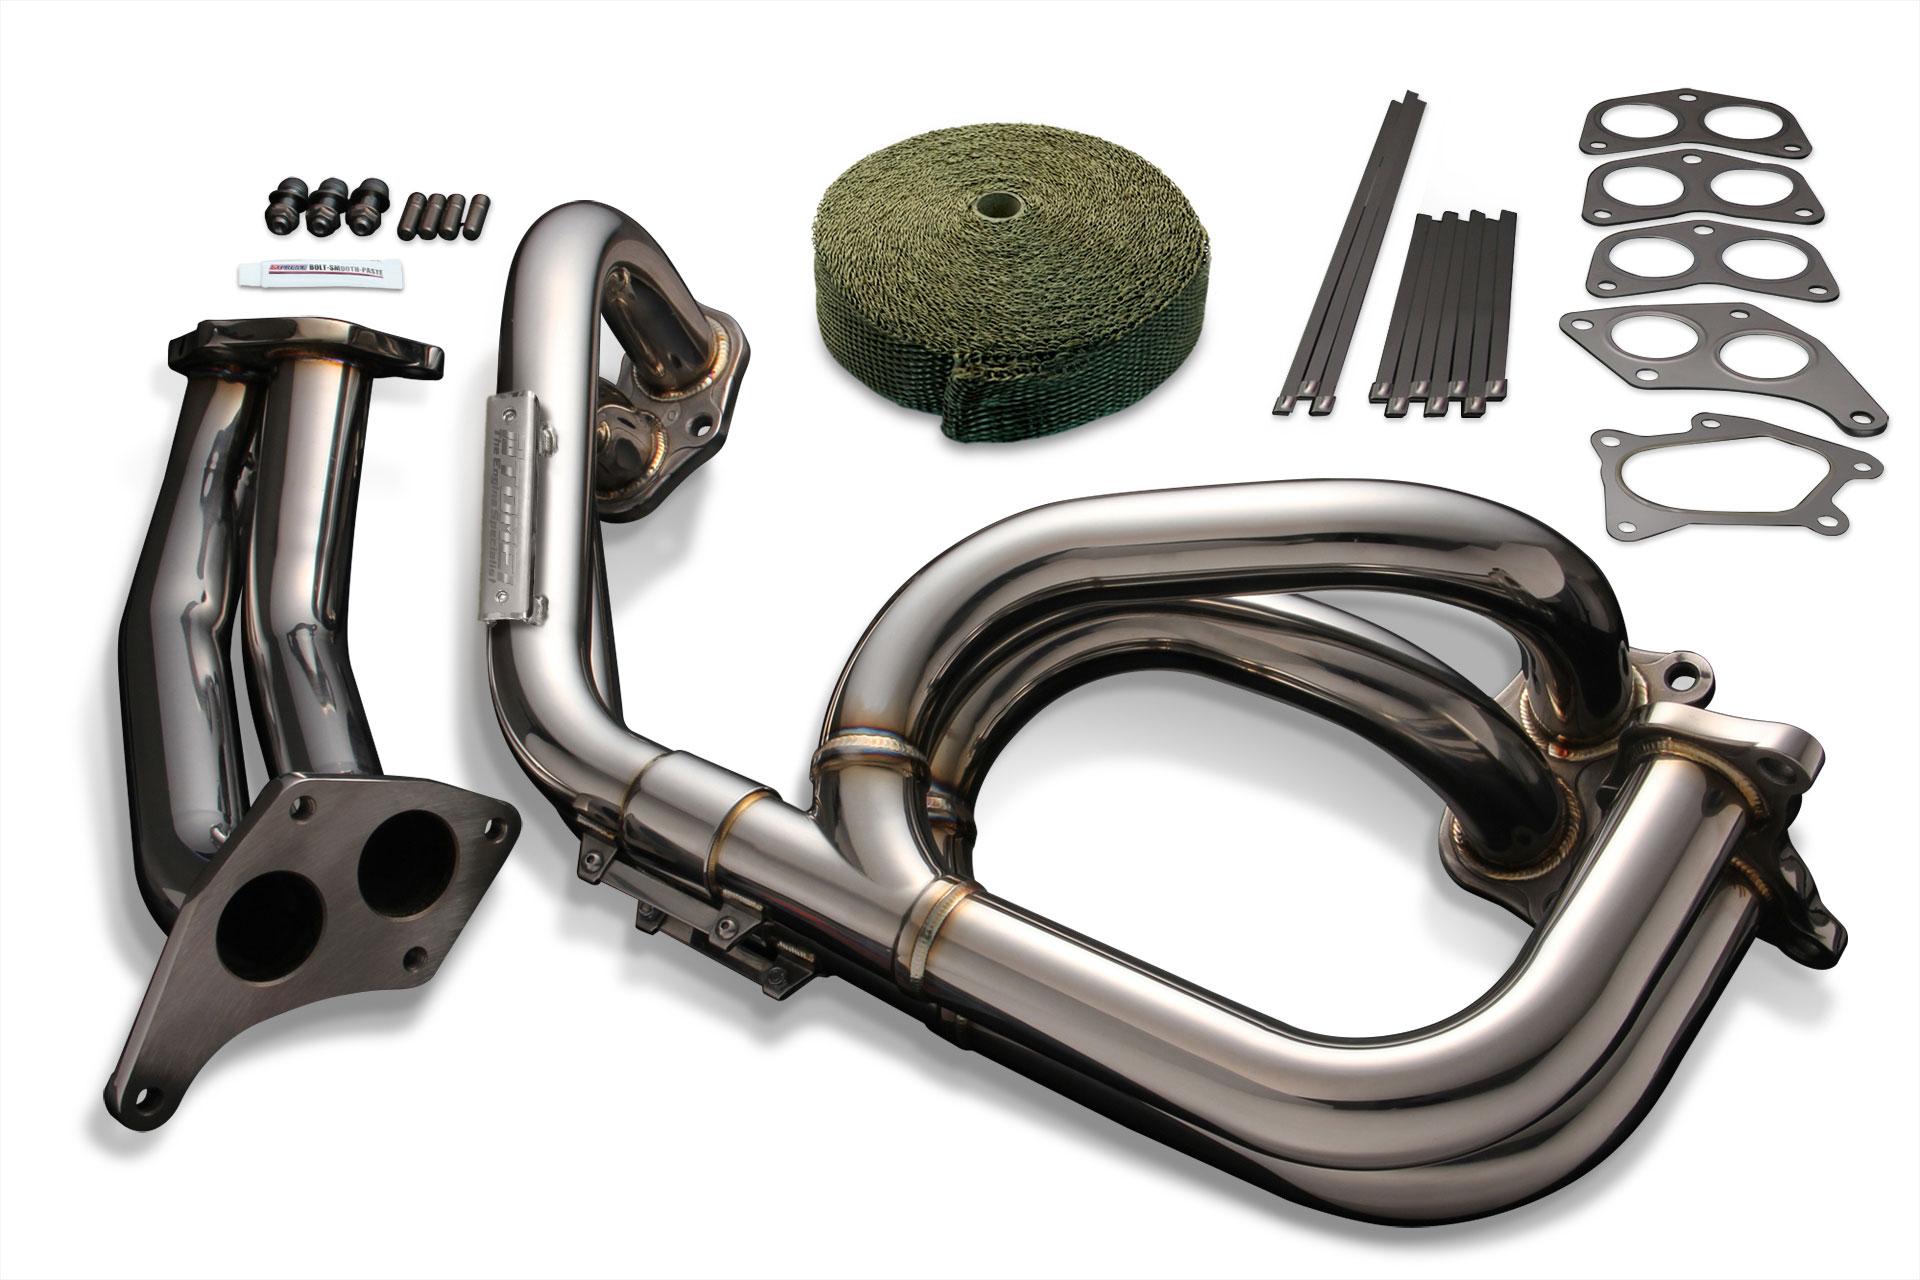 tomei twin scroll equal length exhaust manifold headers subaru wrx sti grb gdb